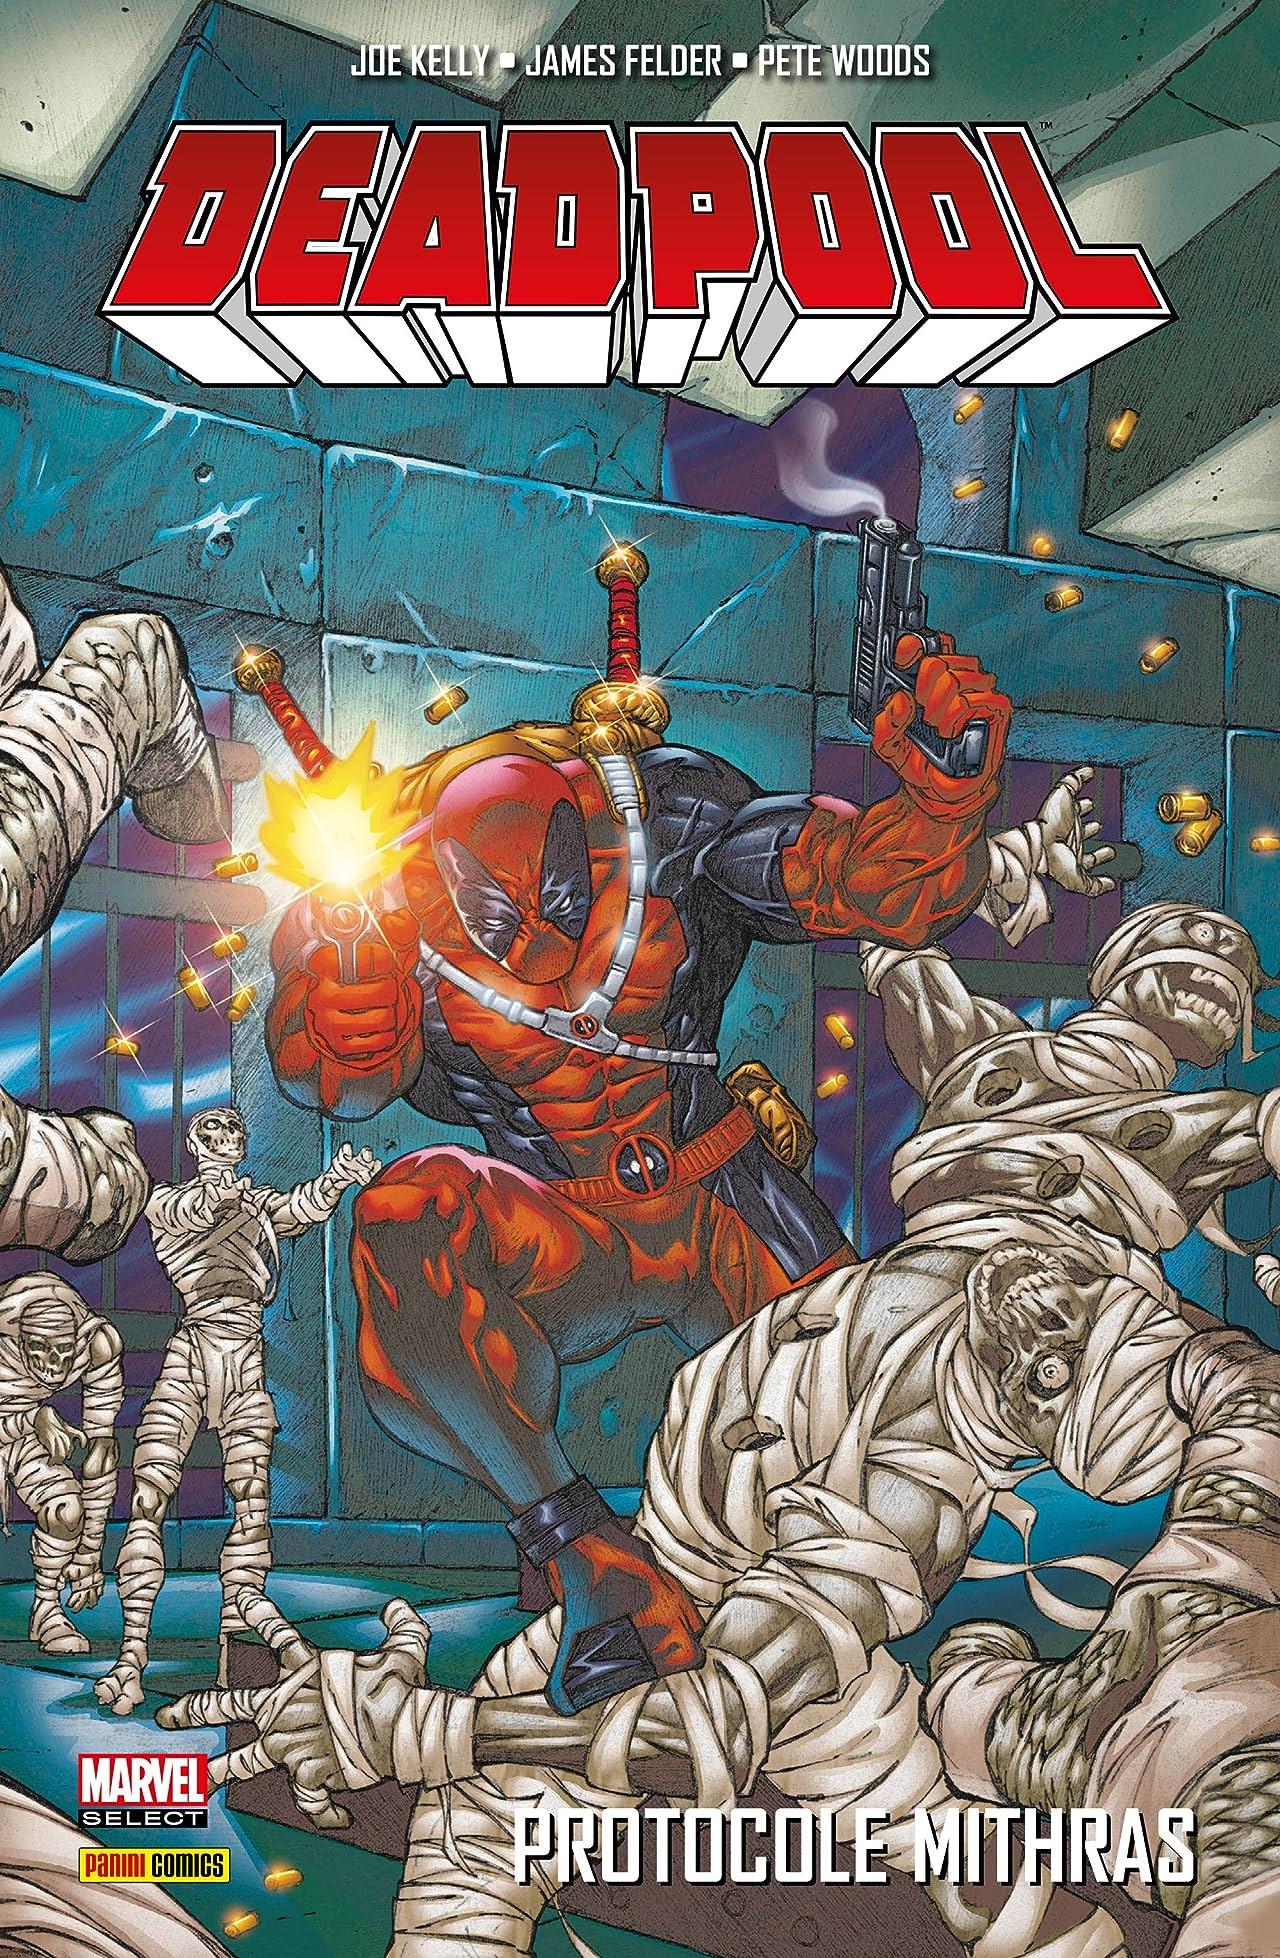 Deadpool: Protocole Mithras